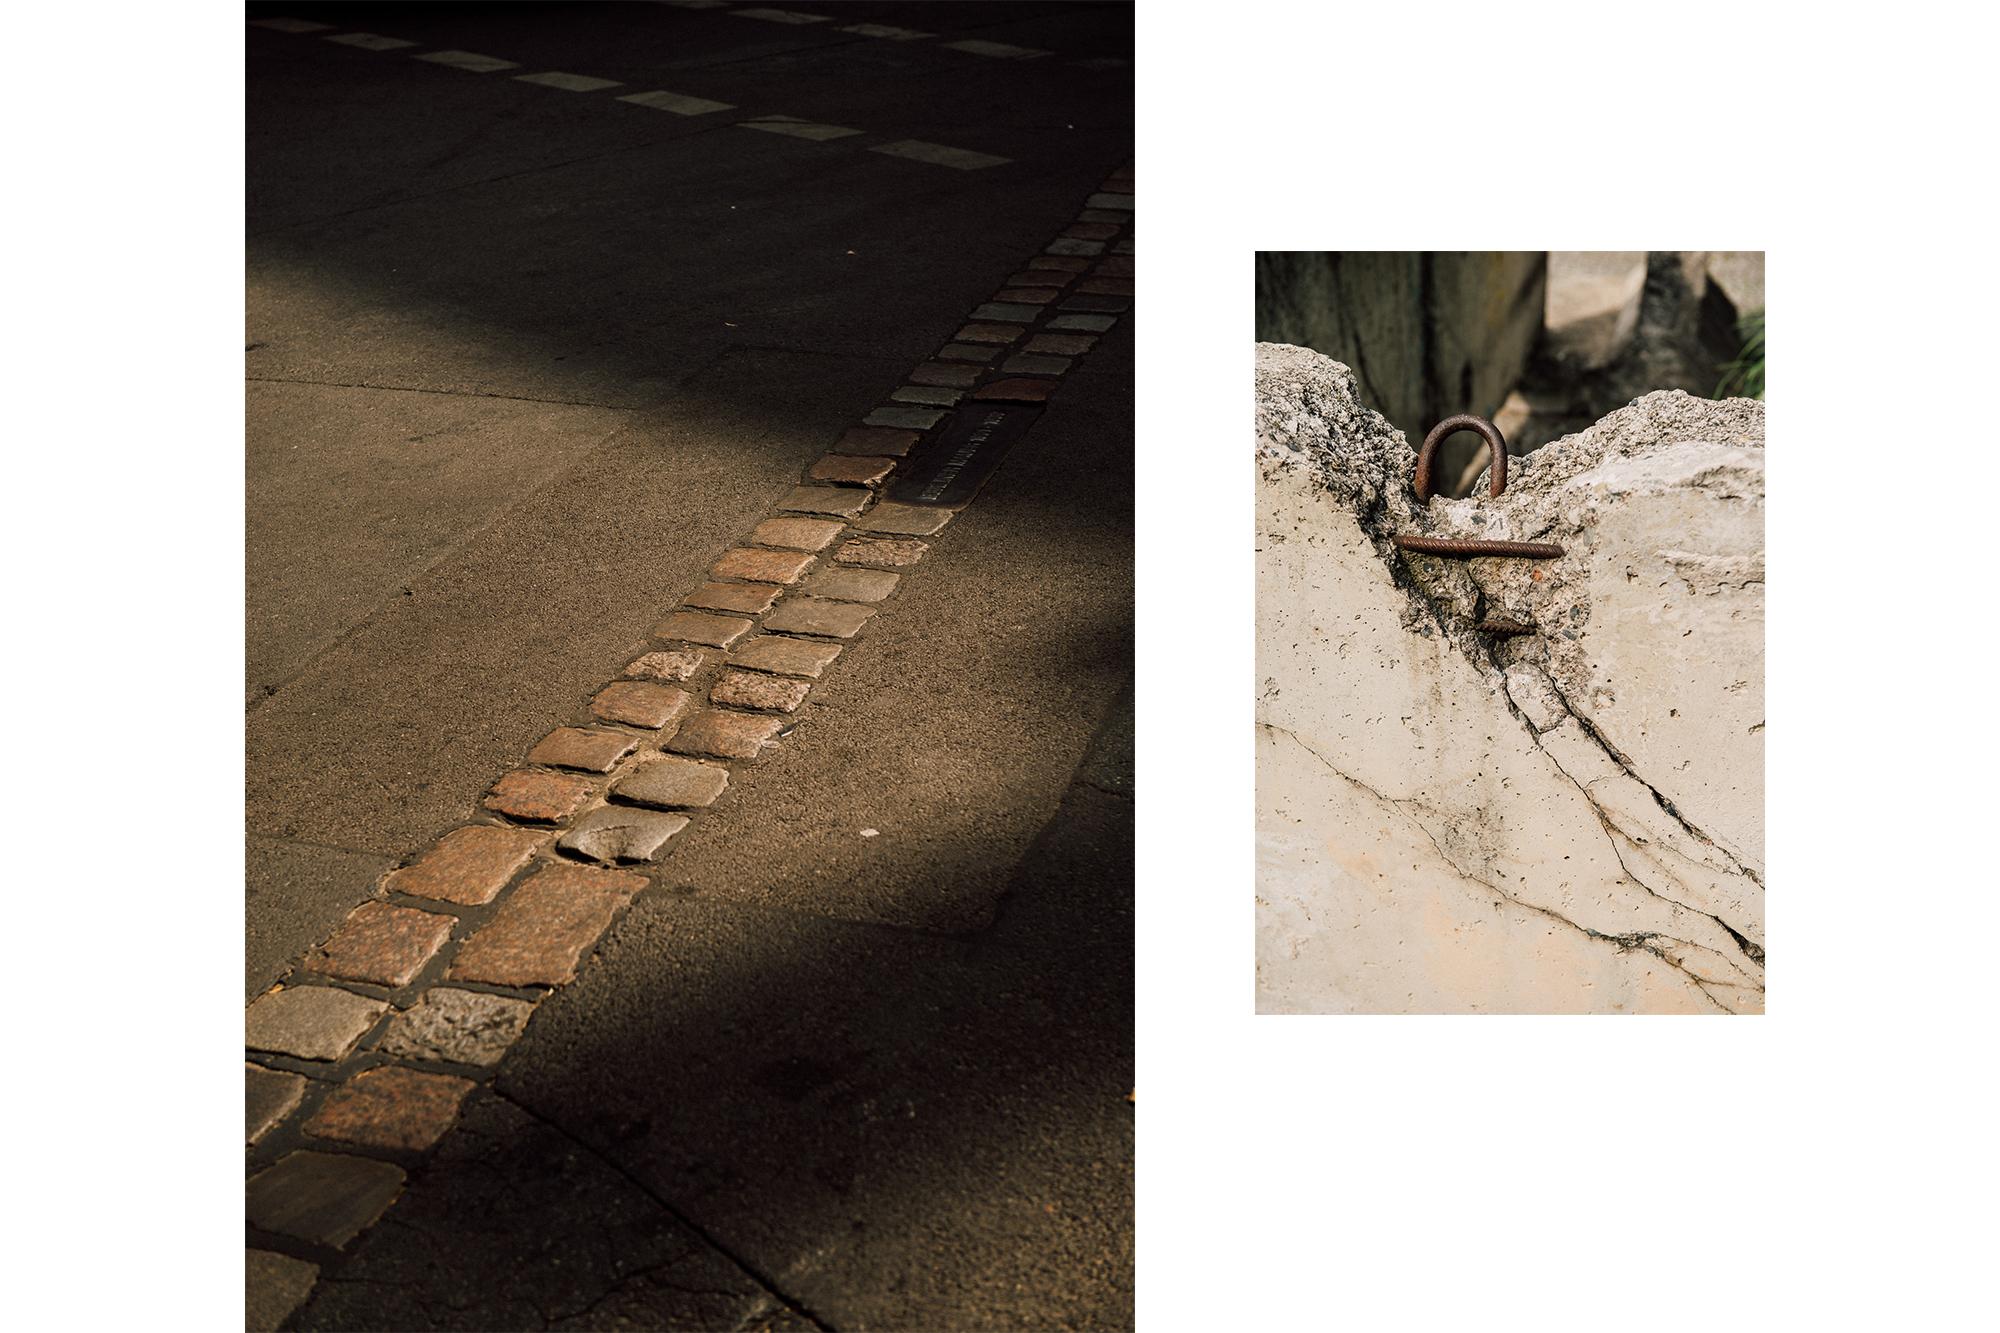 ignant-berlin-wall-biennale-5017-1